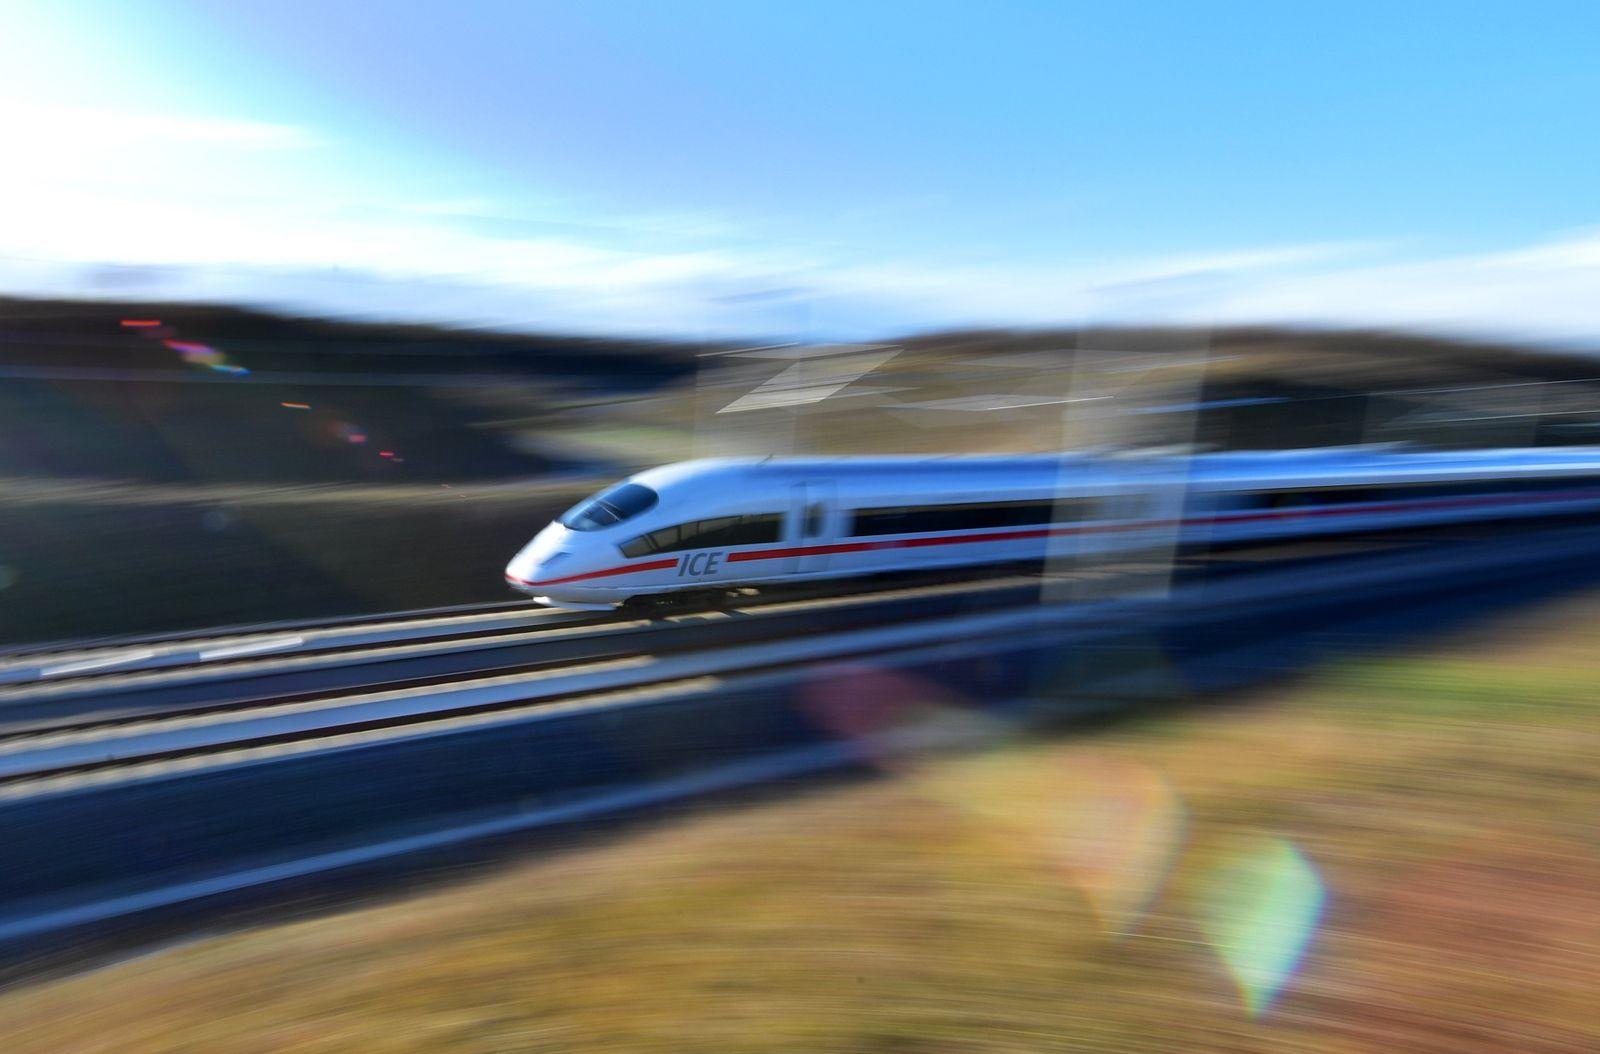 Intercity- Express